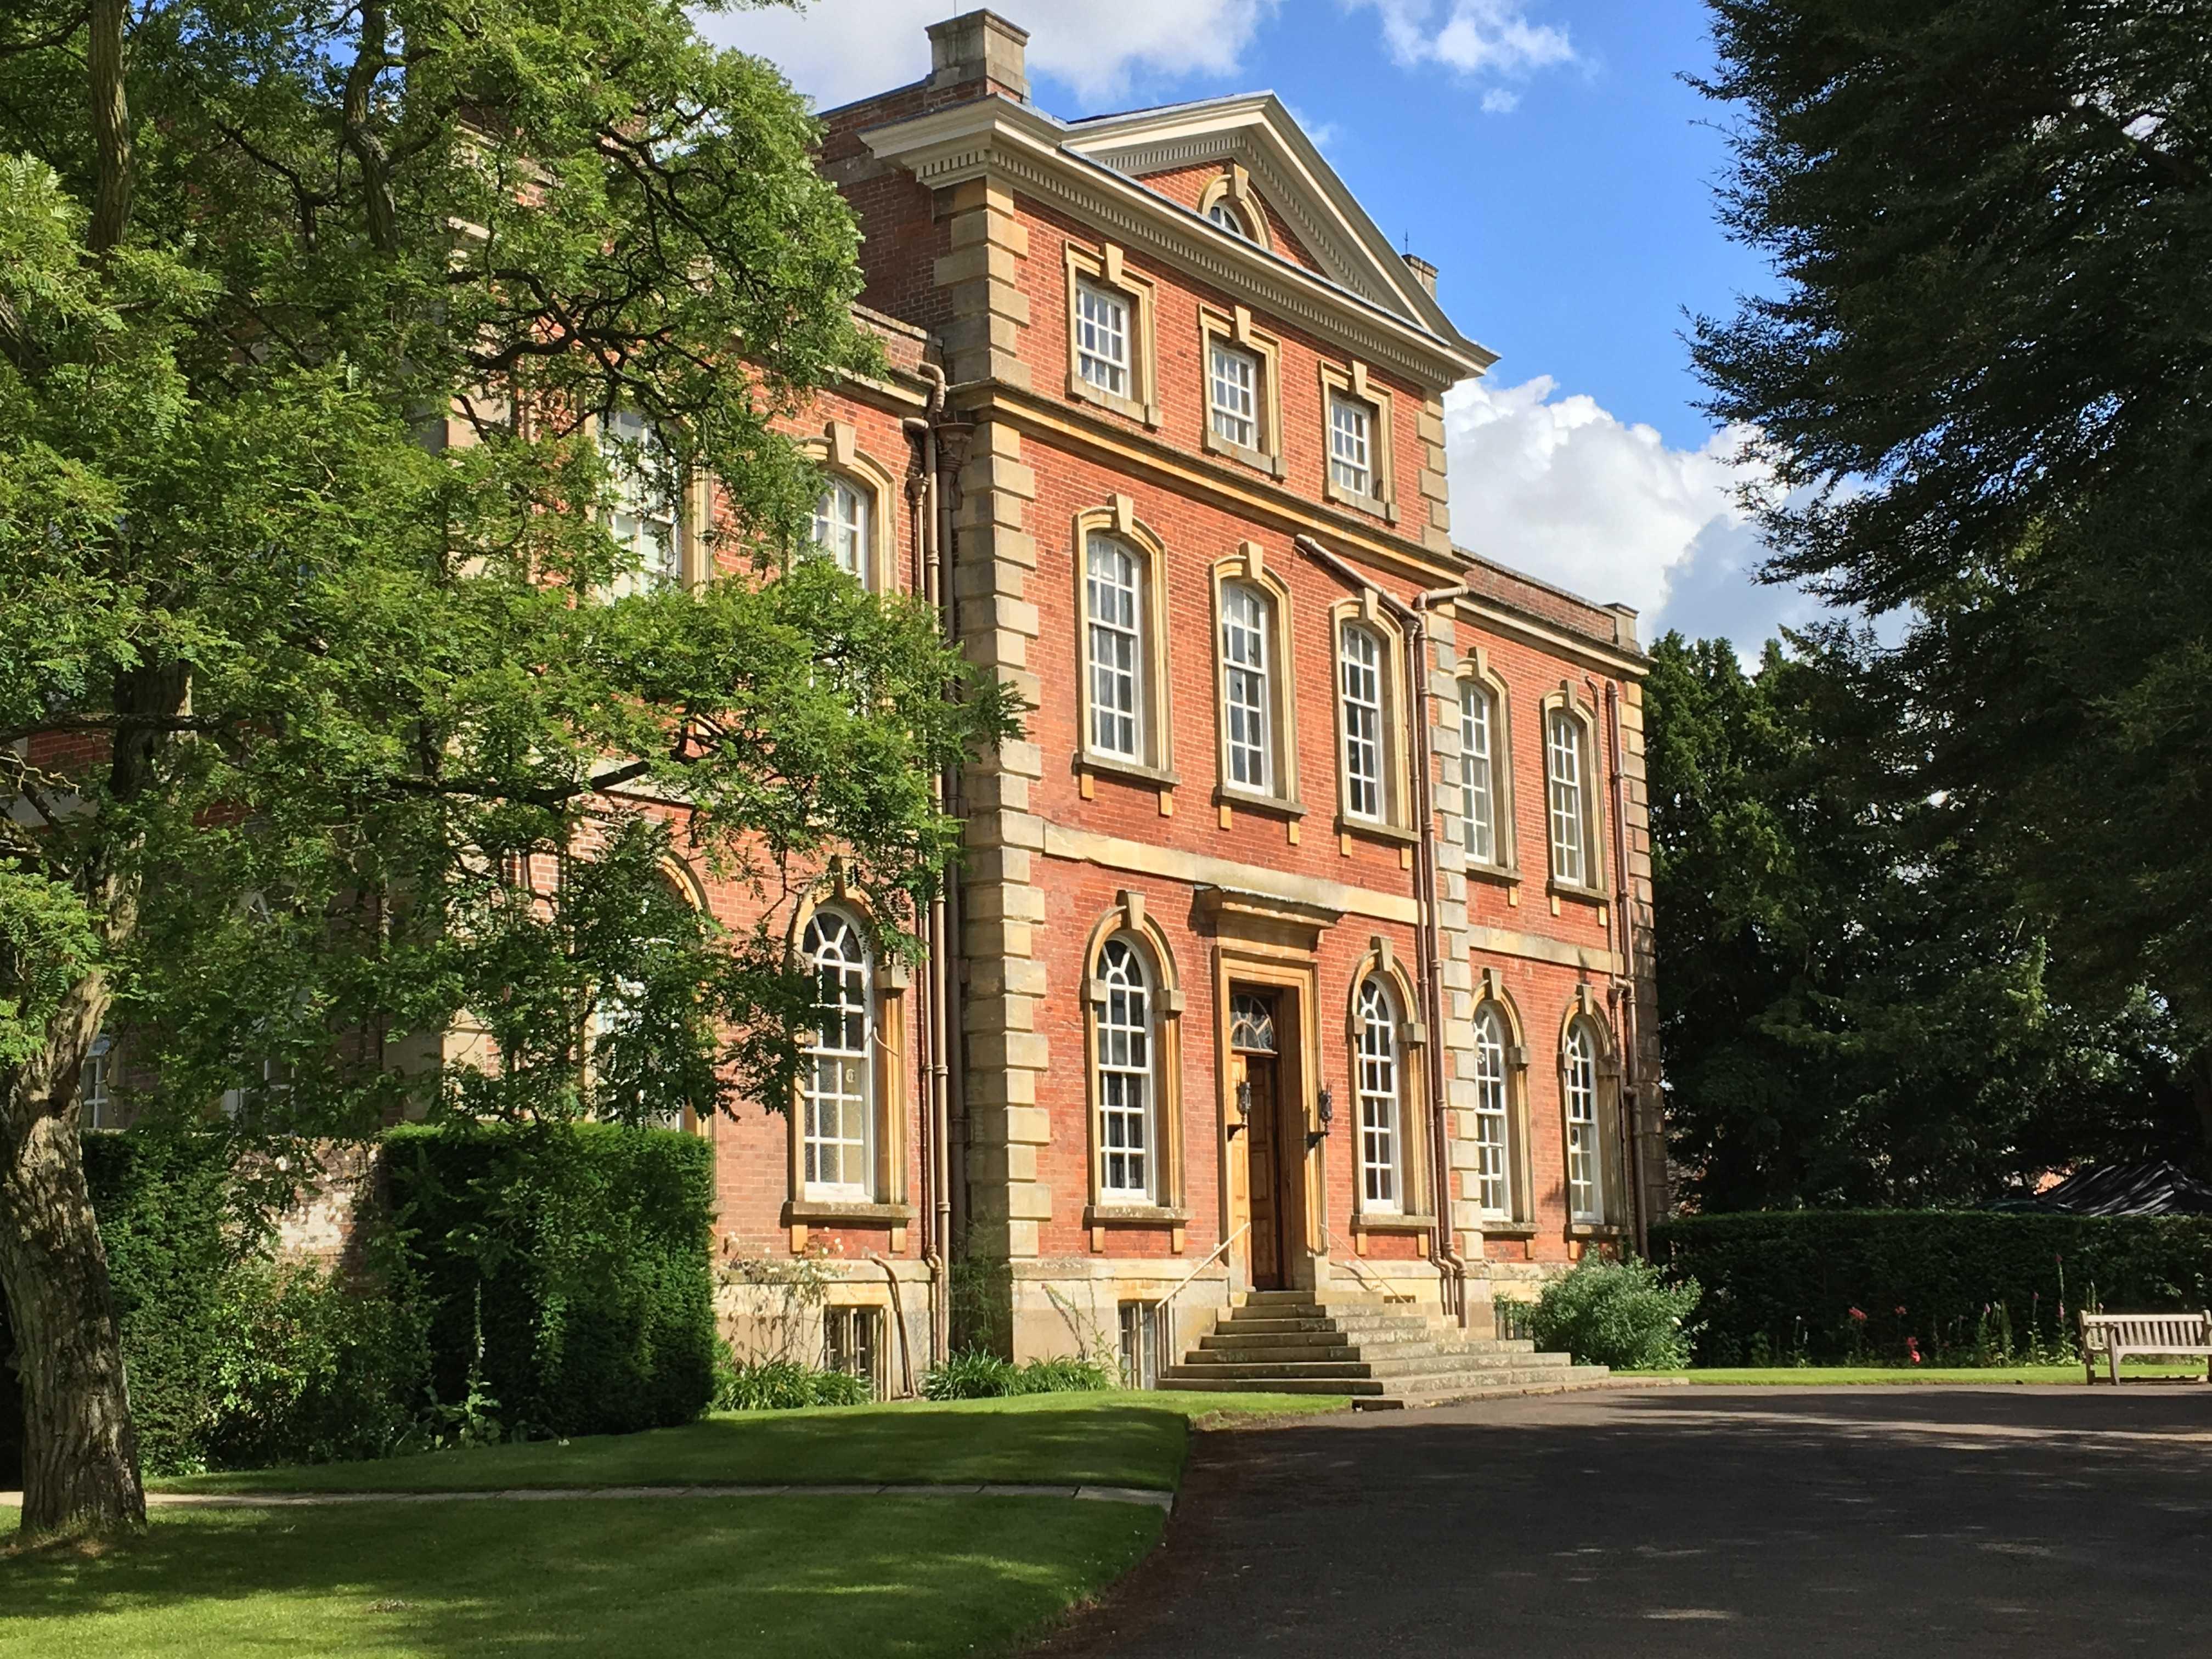 Kingston Bagpuize House, Oxfordshire, England